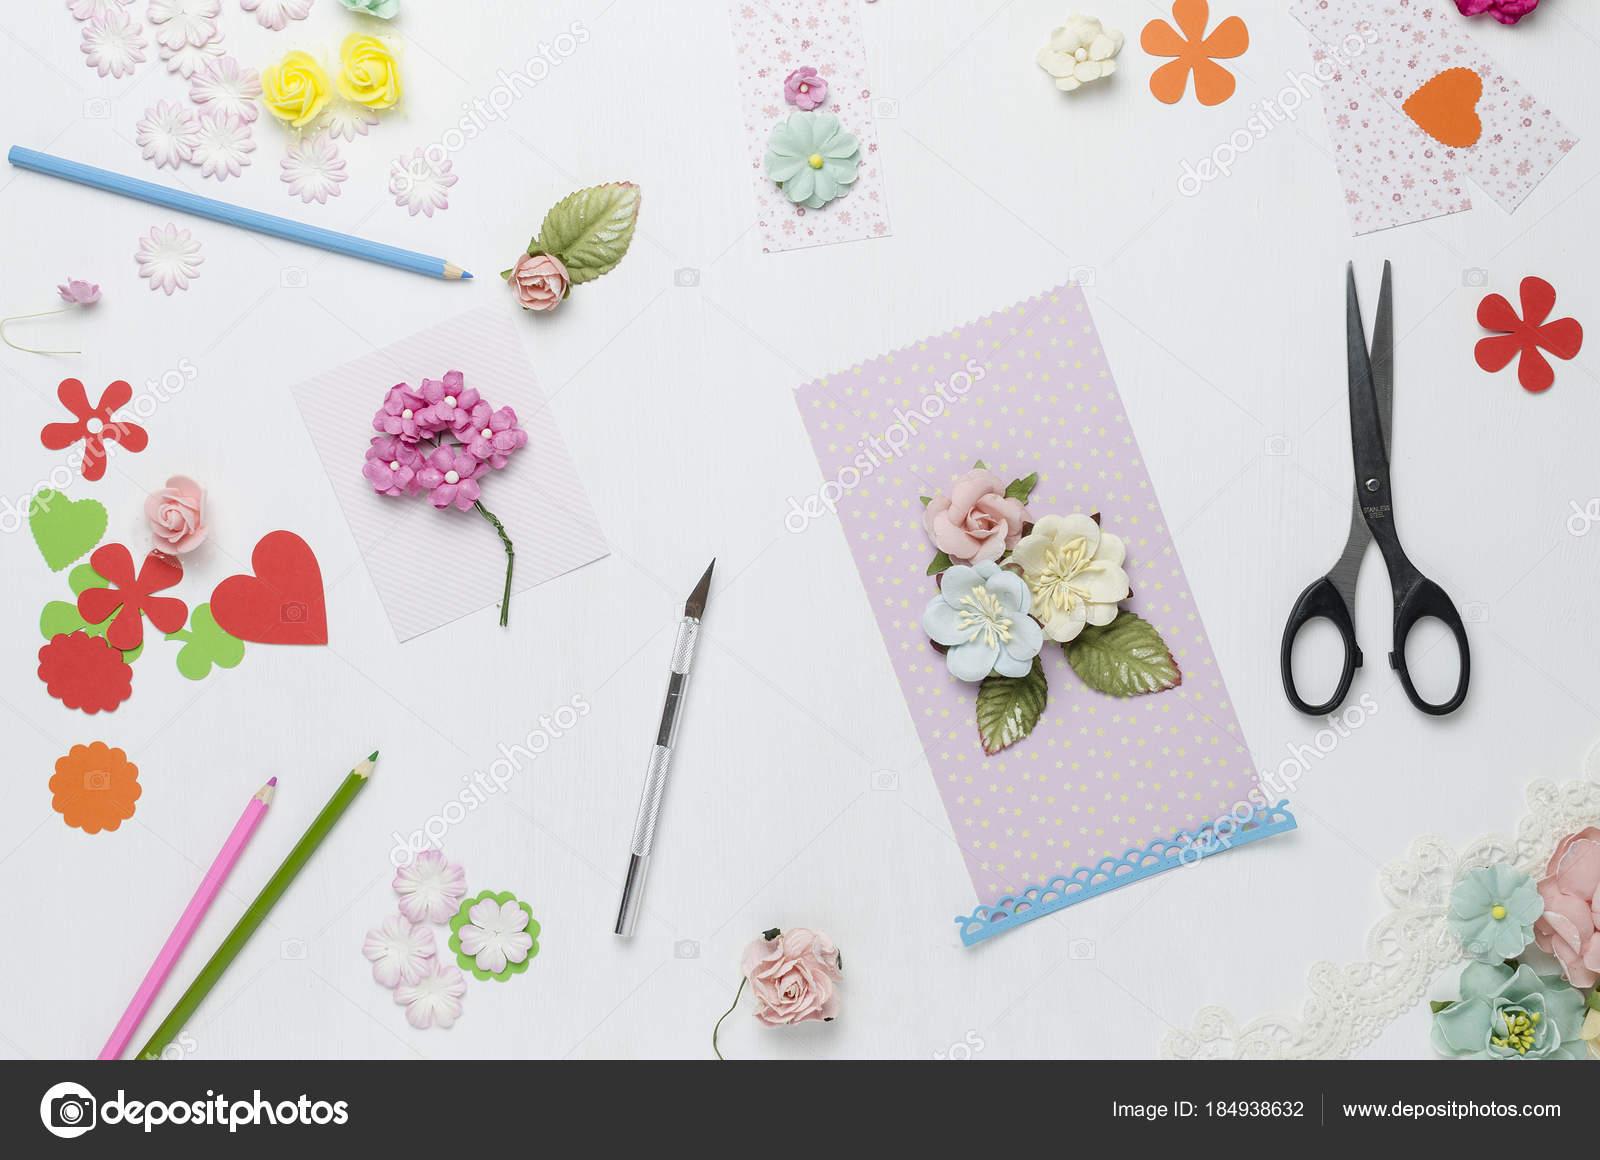 Creative Mess Paper Flowers Scissors Colored Pencils White